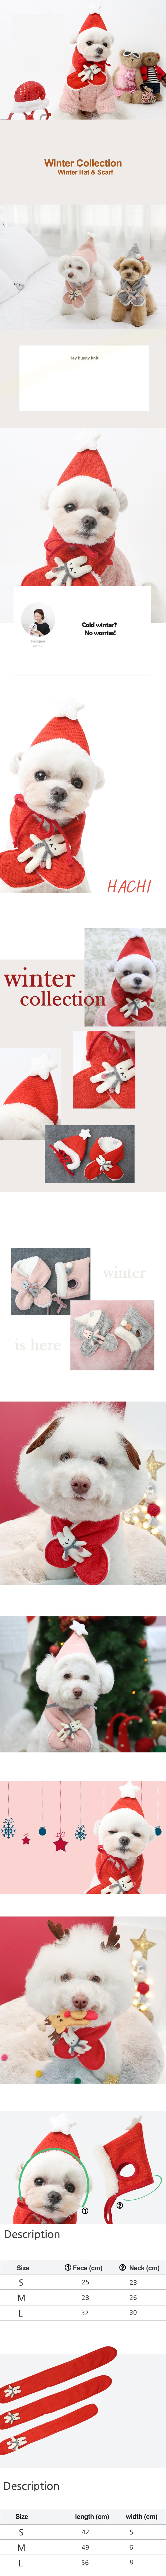 20181204-hey-bunny-knit-set-rd0.jpg